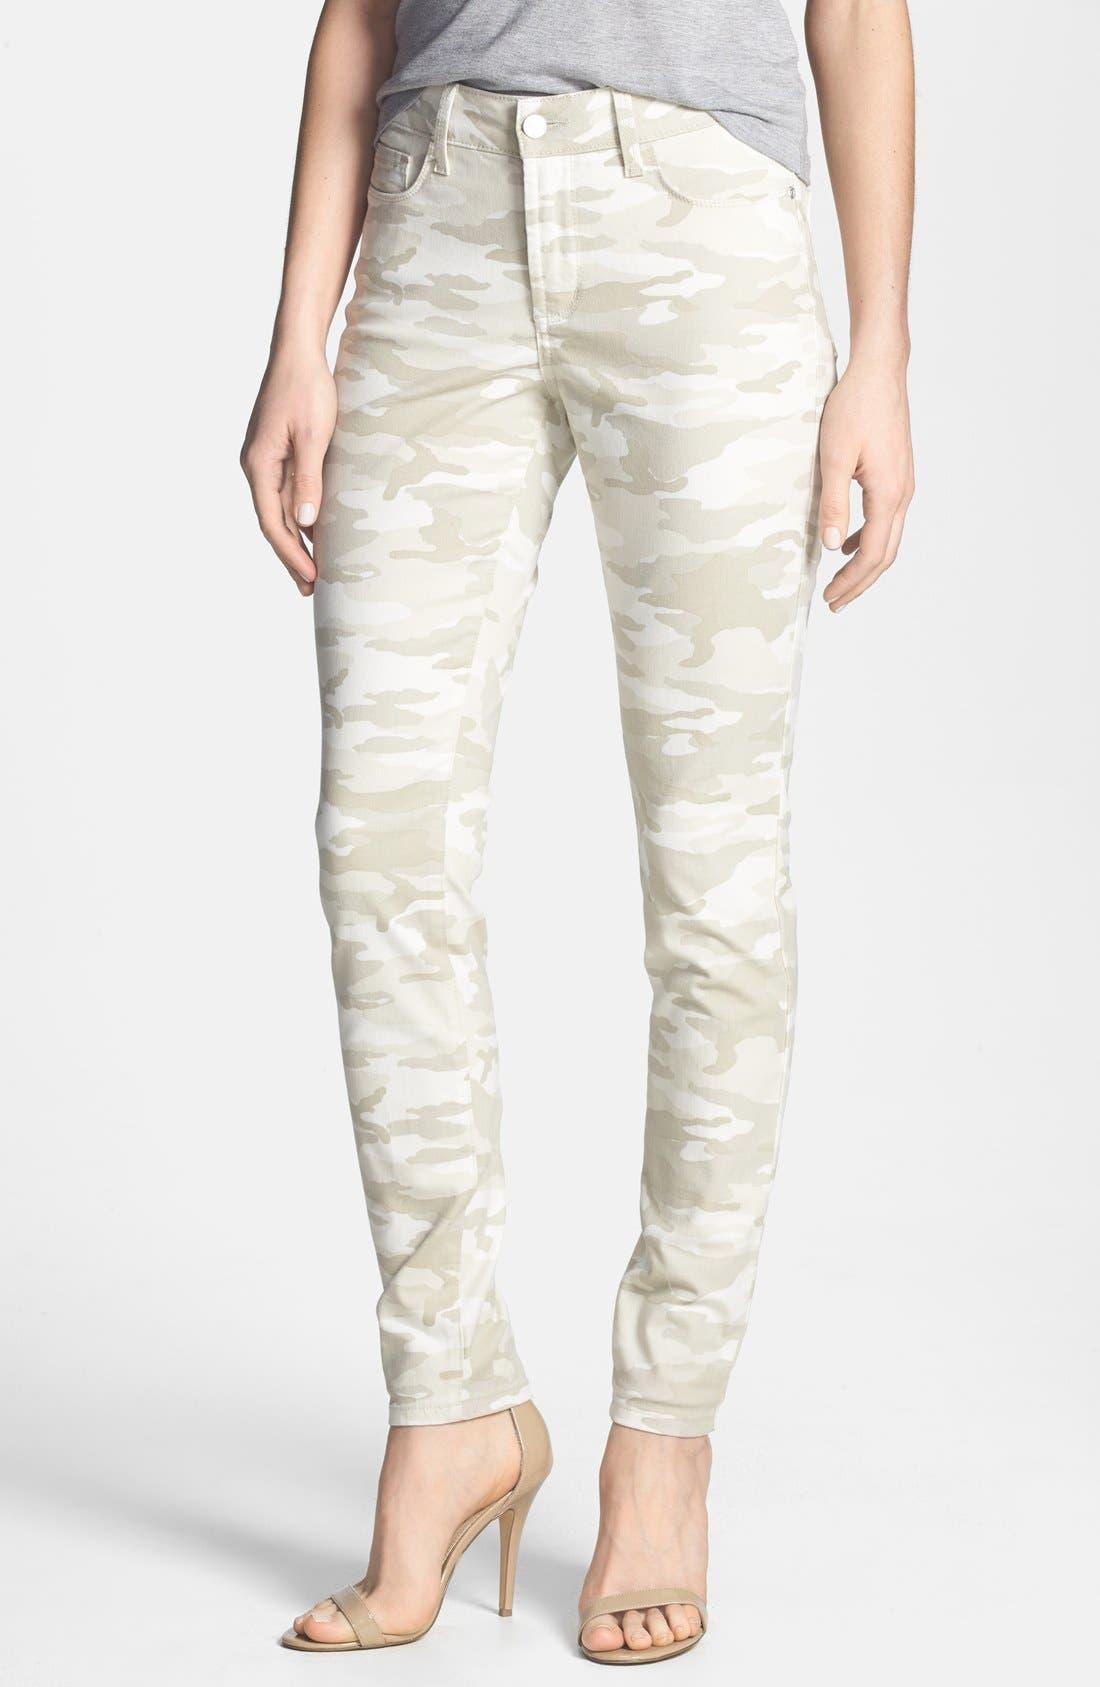 Alternate Image 1 Selected - NYDJ 'Ami' Camo Stretch Super Skinny Jeans (Regular & Petite)